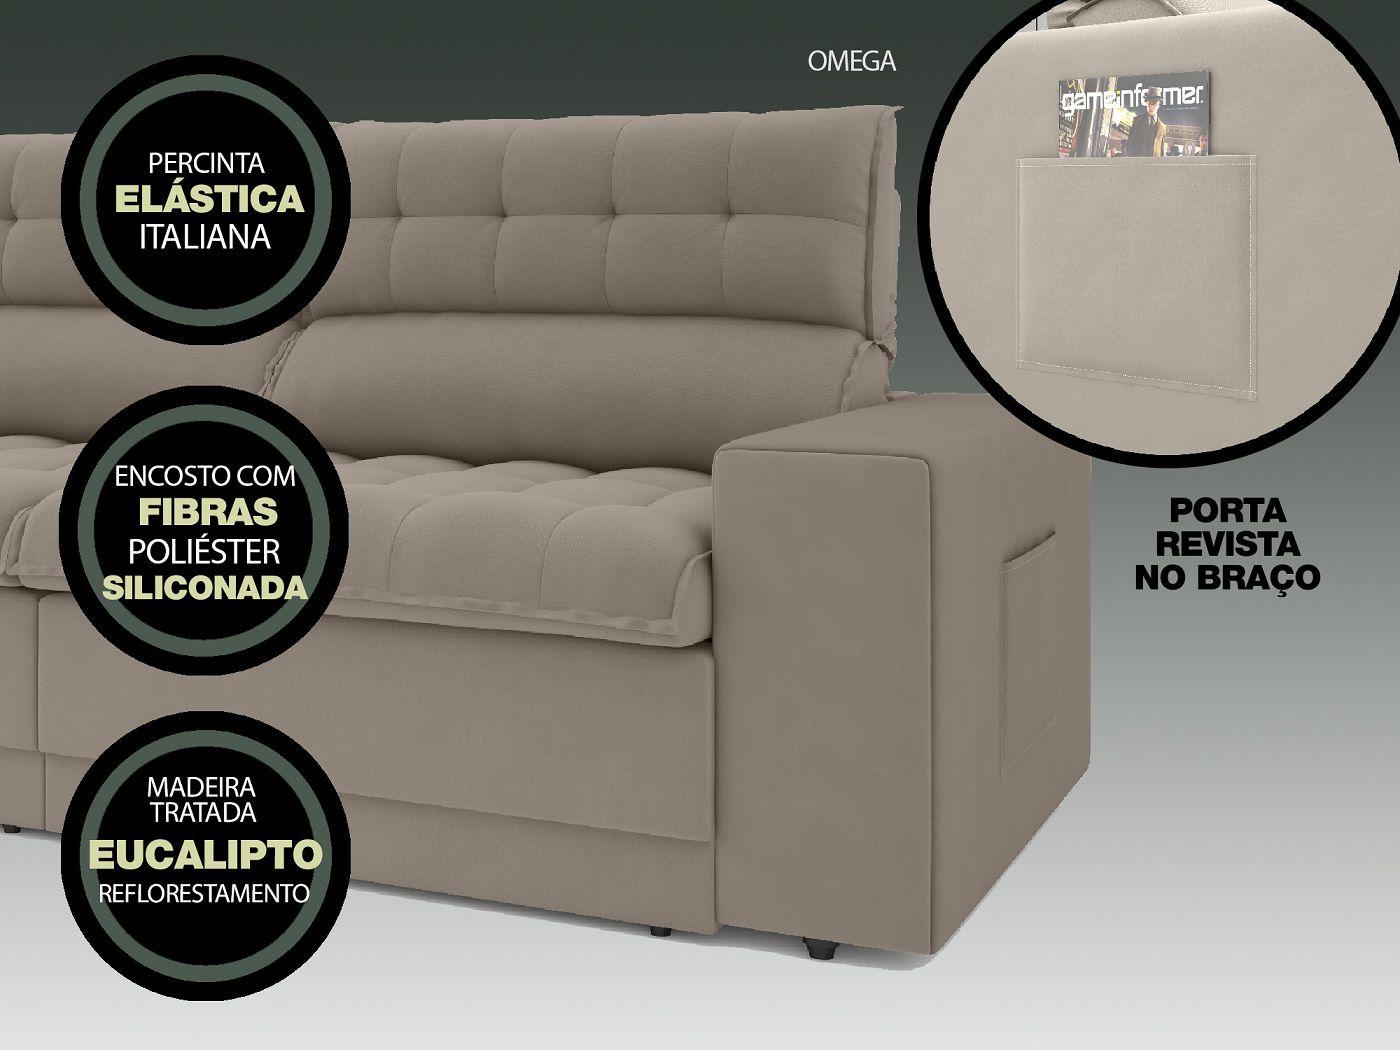 Sofá Omega 2,30m Assento Retrátil e Reclinável Velosuede Bege - NETSOFAS  - NETSOFÁS